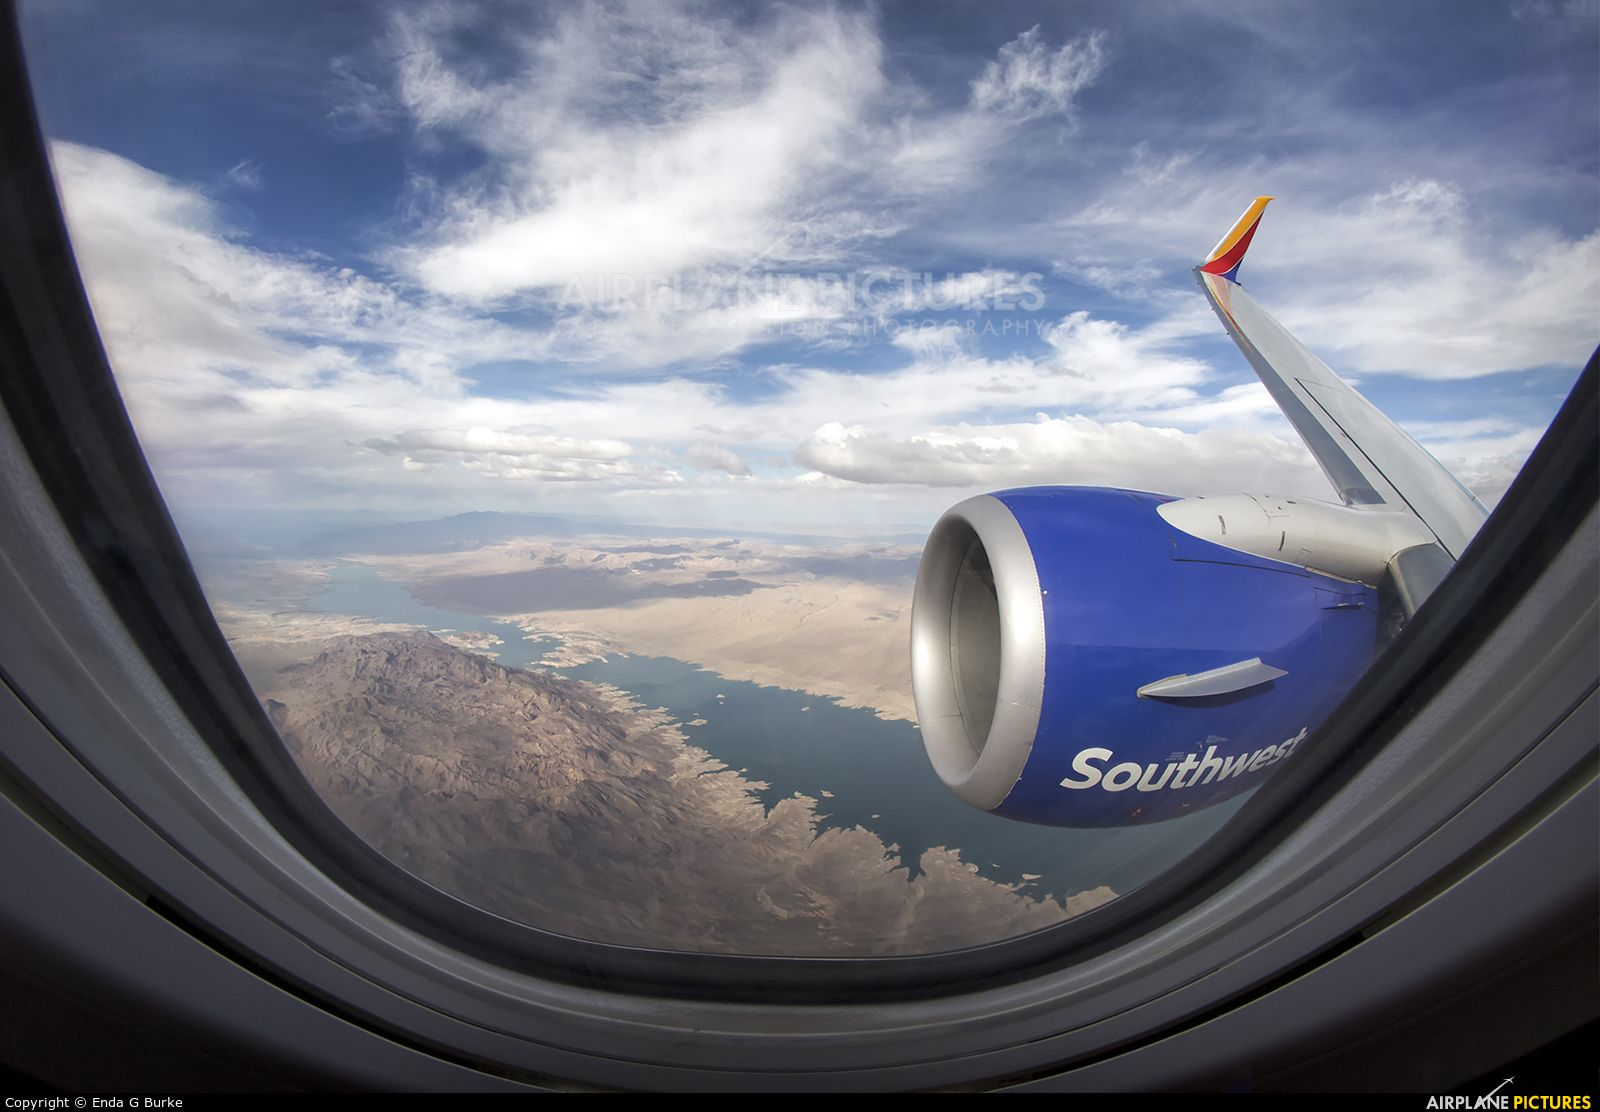 Southwest Airlines 737 800 Photo Taken By Enda G Burke Southwest Airlines Airlines Plane Window